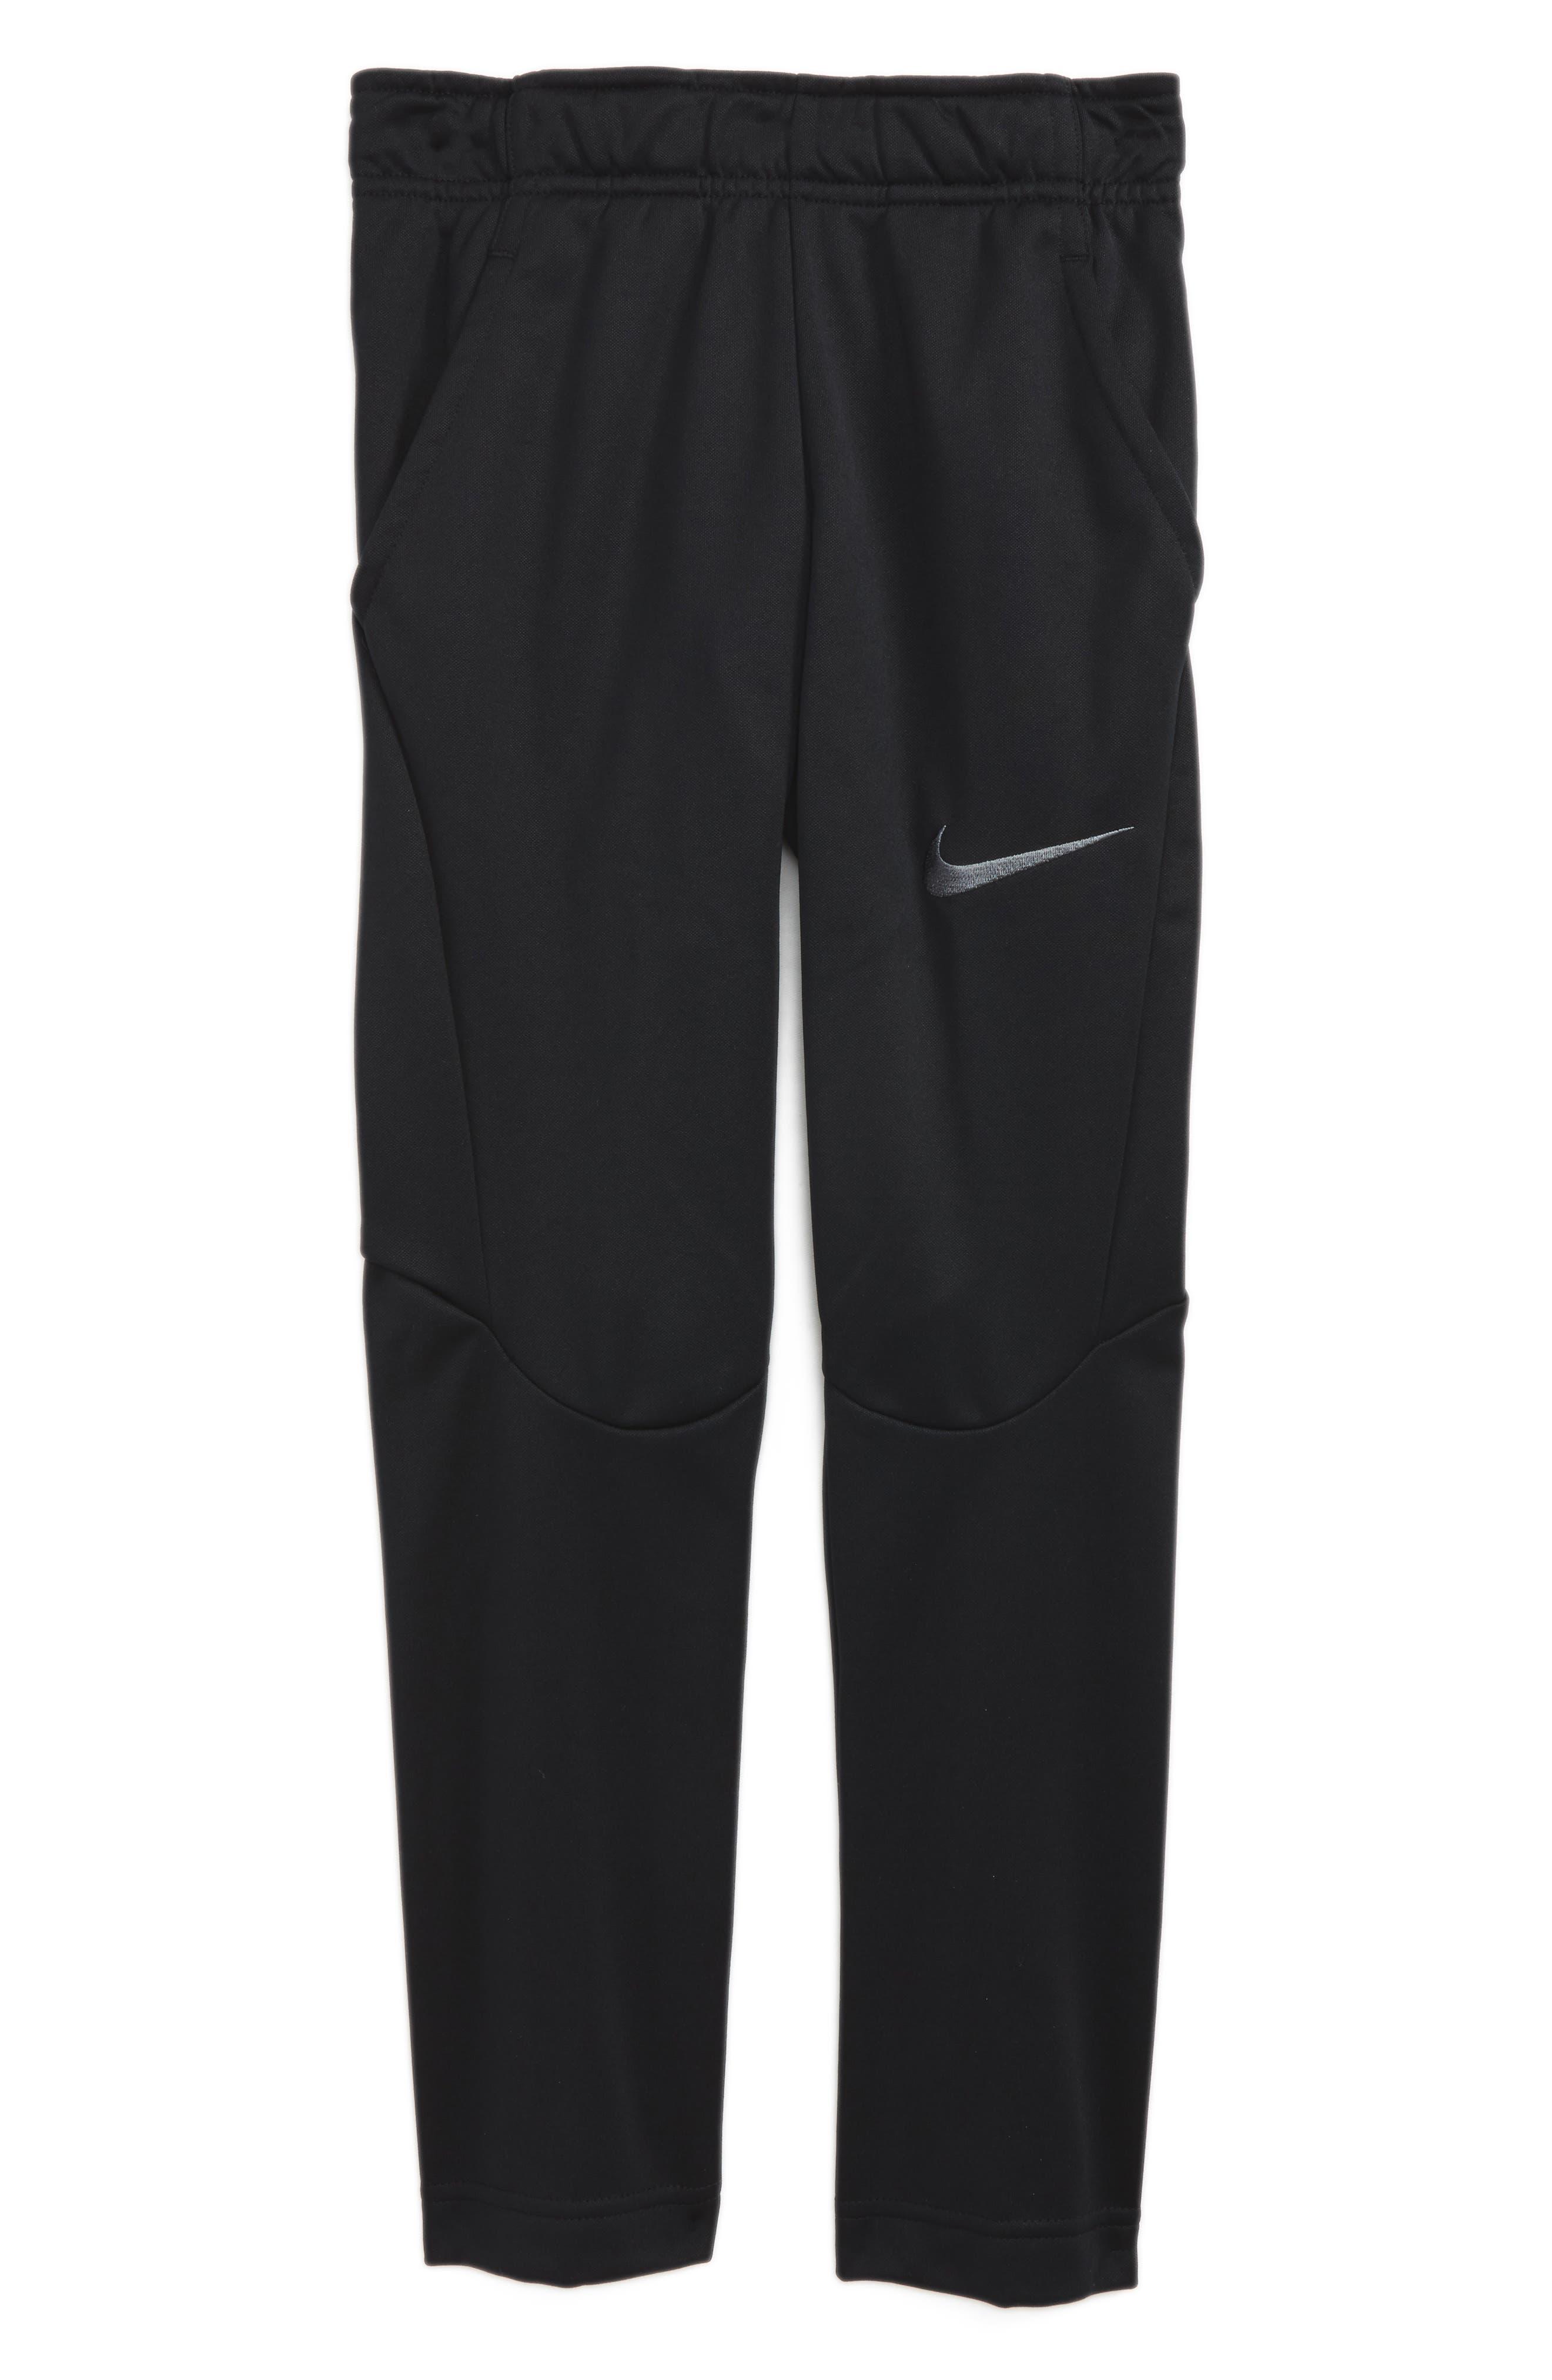 Alternate Image 1 Selected - Nike Therma-FIT Training Pants (Little Boys & Big Boys)